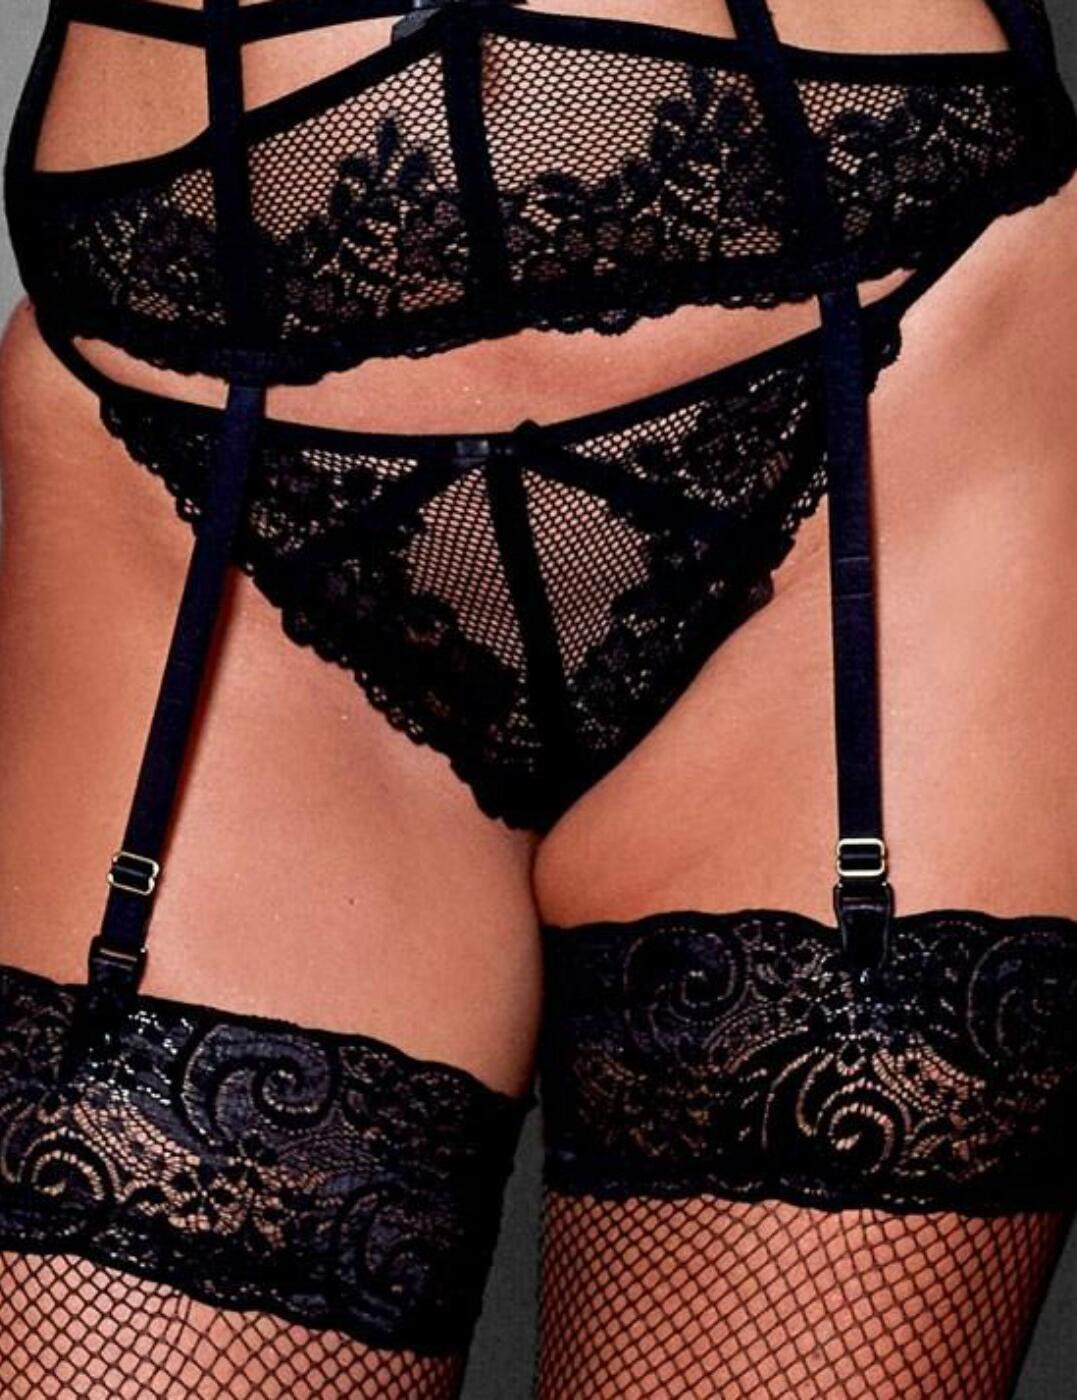 50004 Pour Moi Strapped G String - 50004 Black